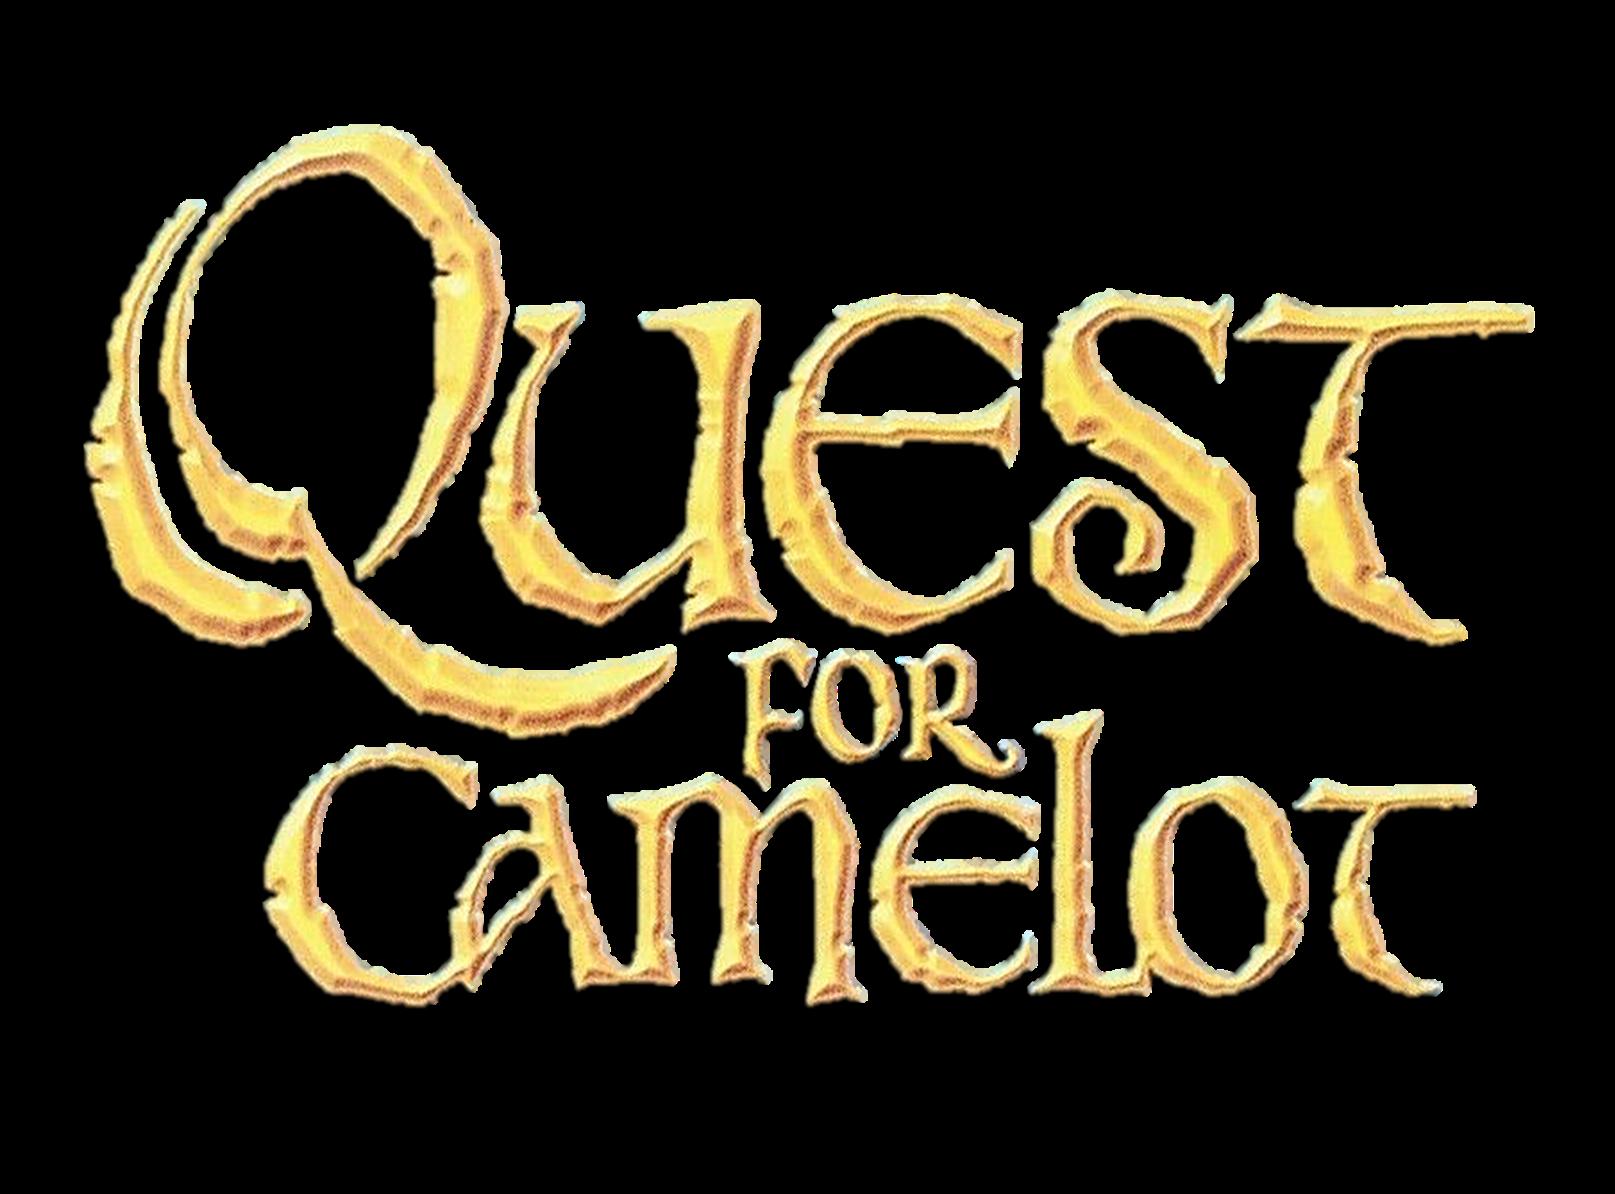 Image - QUEST FOR CAMELOT SHADOWED LOGO.png | Warner Bros ... - photo#31